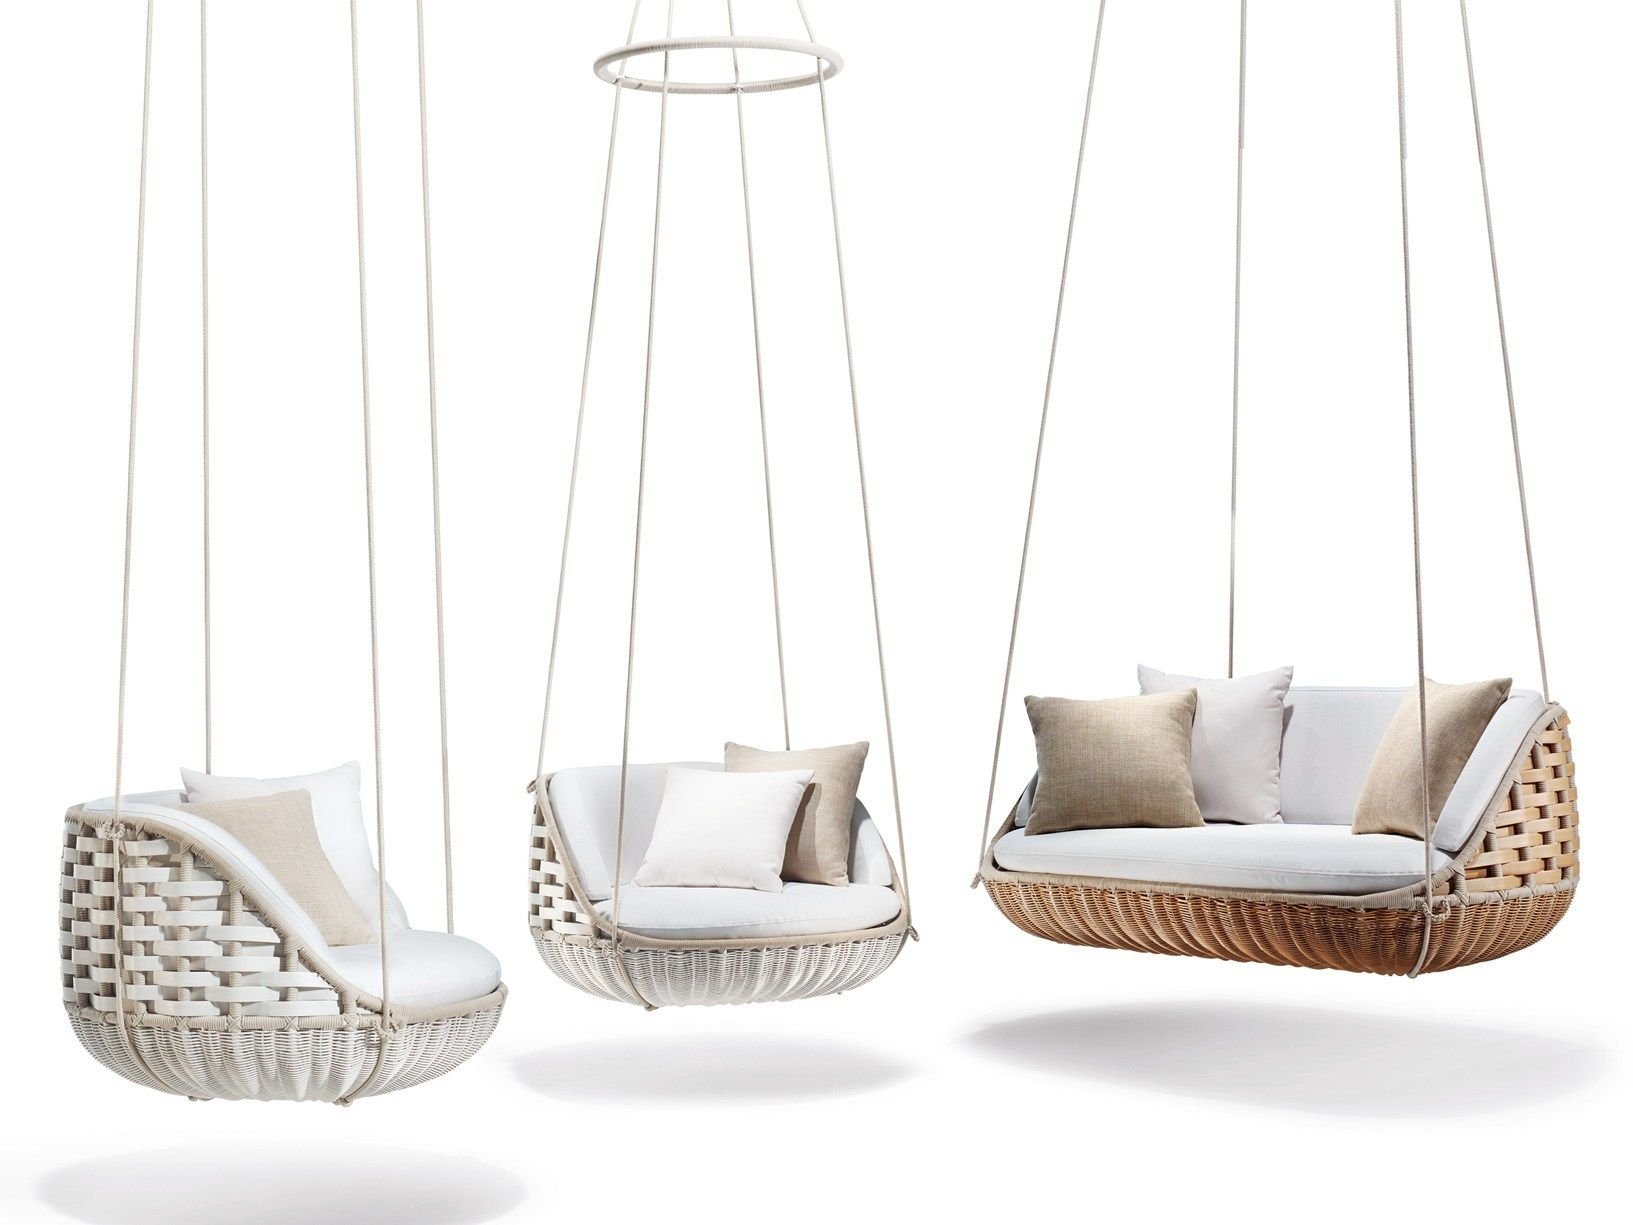 Wondrous Dedon Presents Swingme And Swingus Machost Co Dining Chair Design Ideas Machostcouk